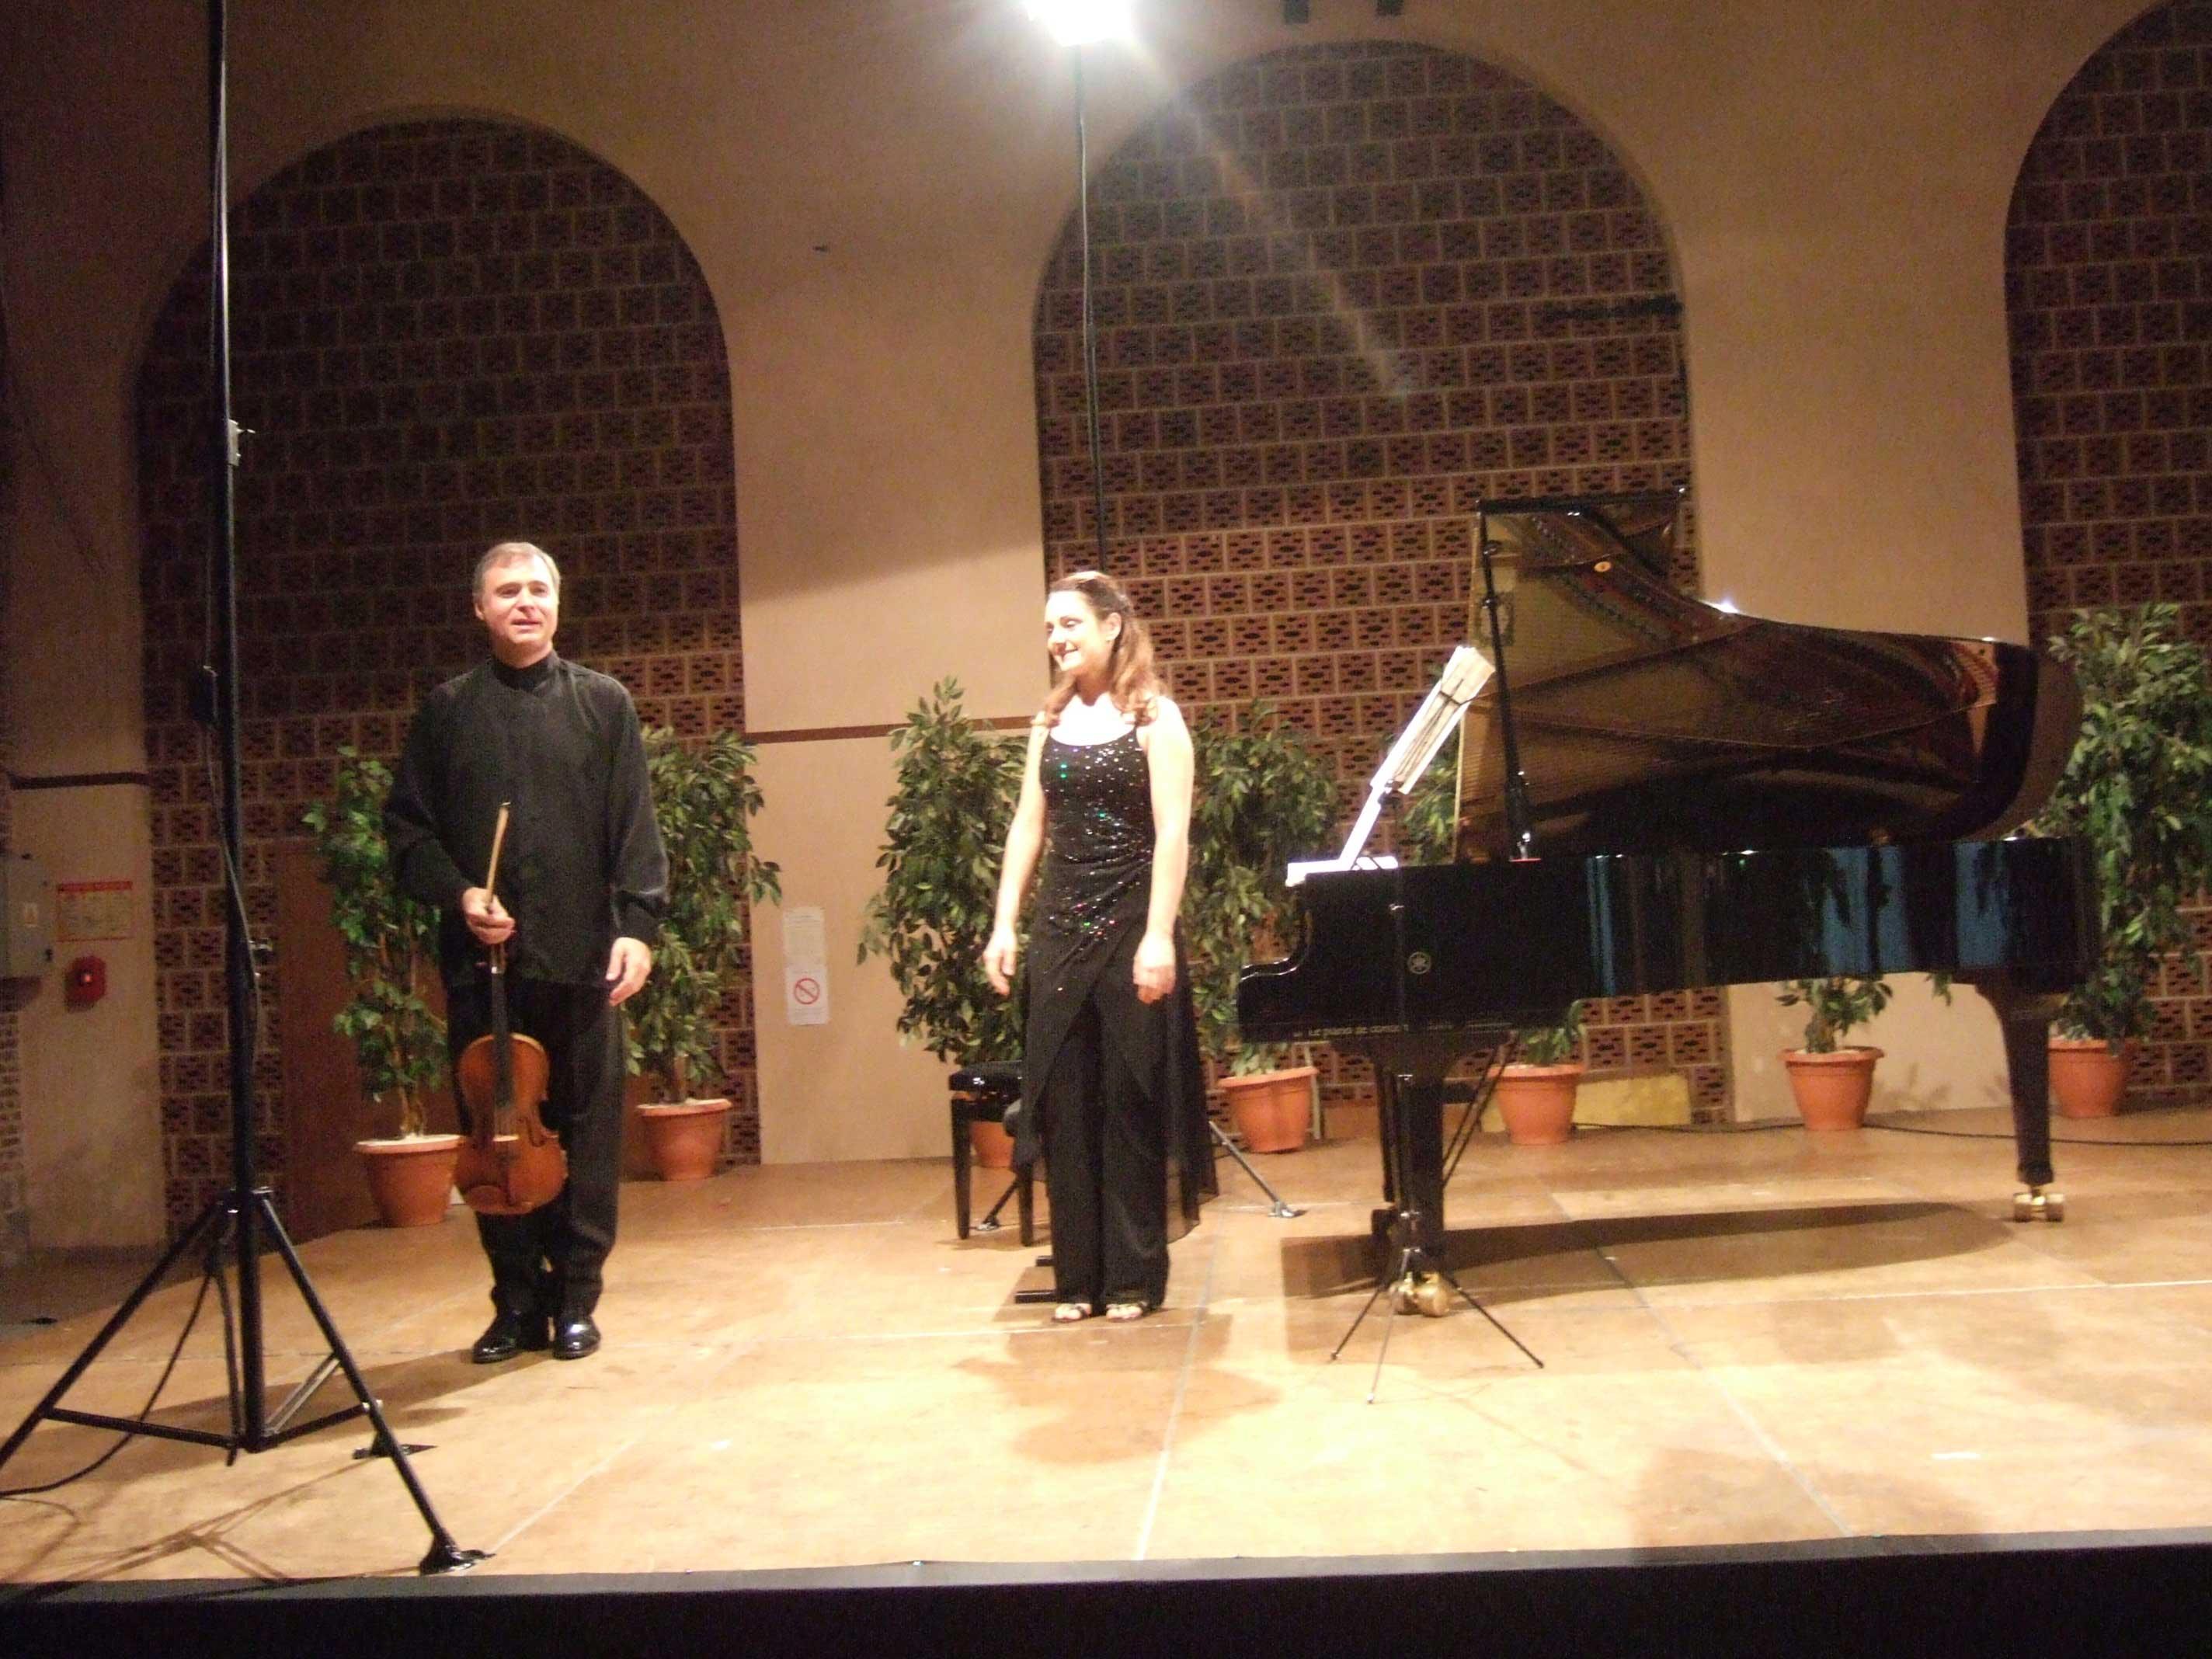 Vladimir Bukac et Emmanuelle Swiercz